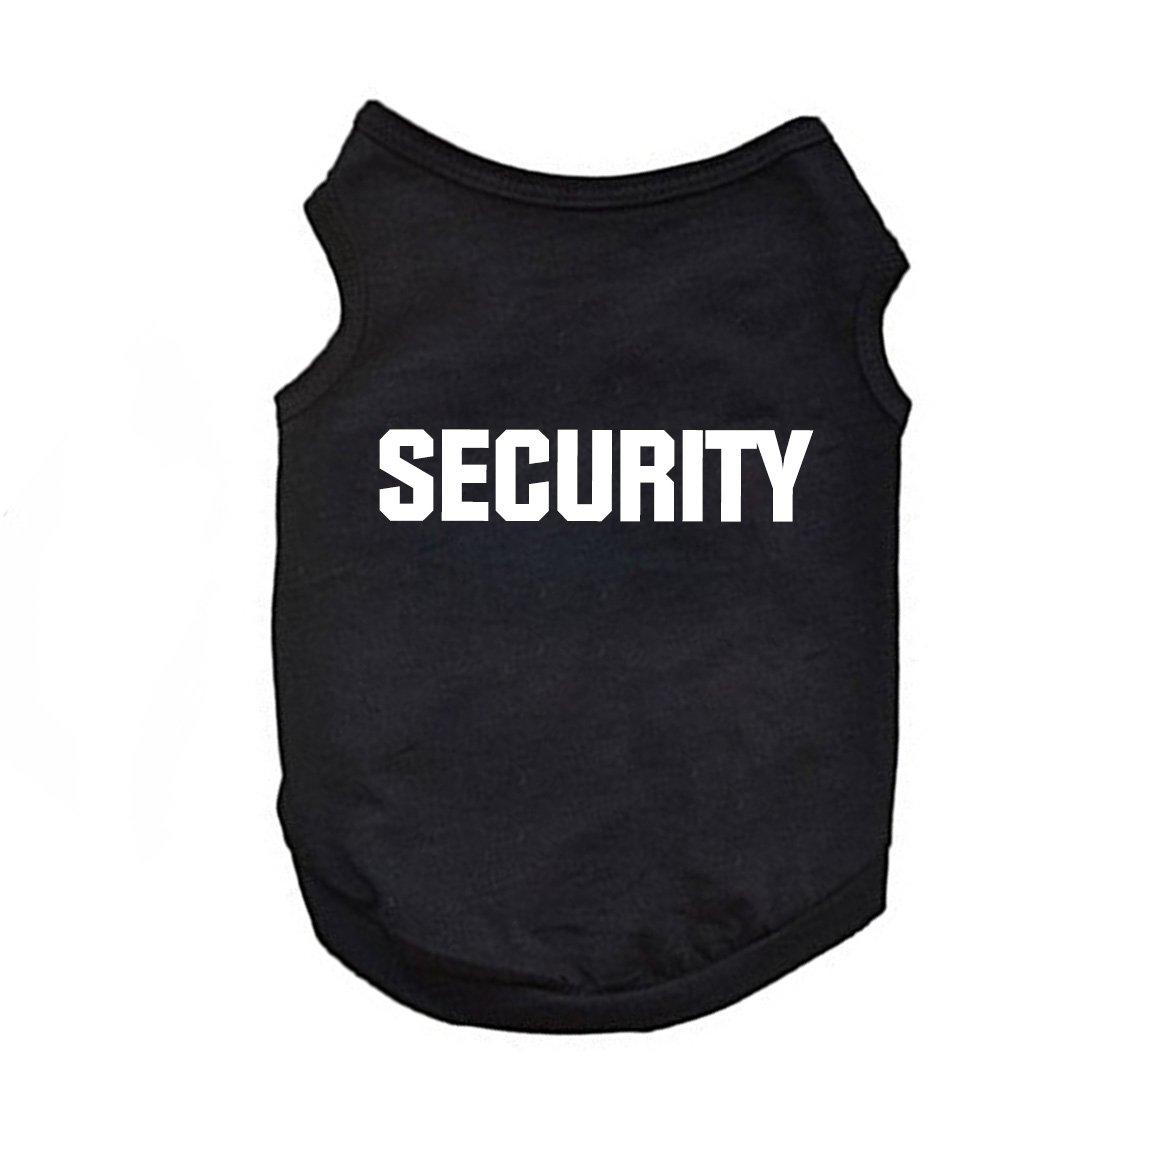 Doggie Style Store Black Security Guard Pet Dog T-Shirt Vest Shirt Top 7 Sizes